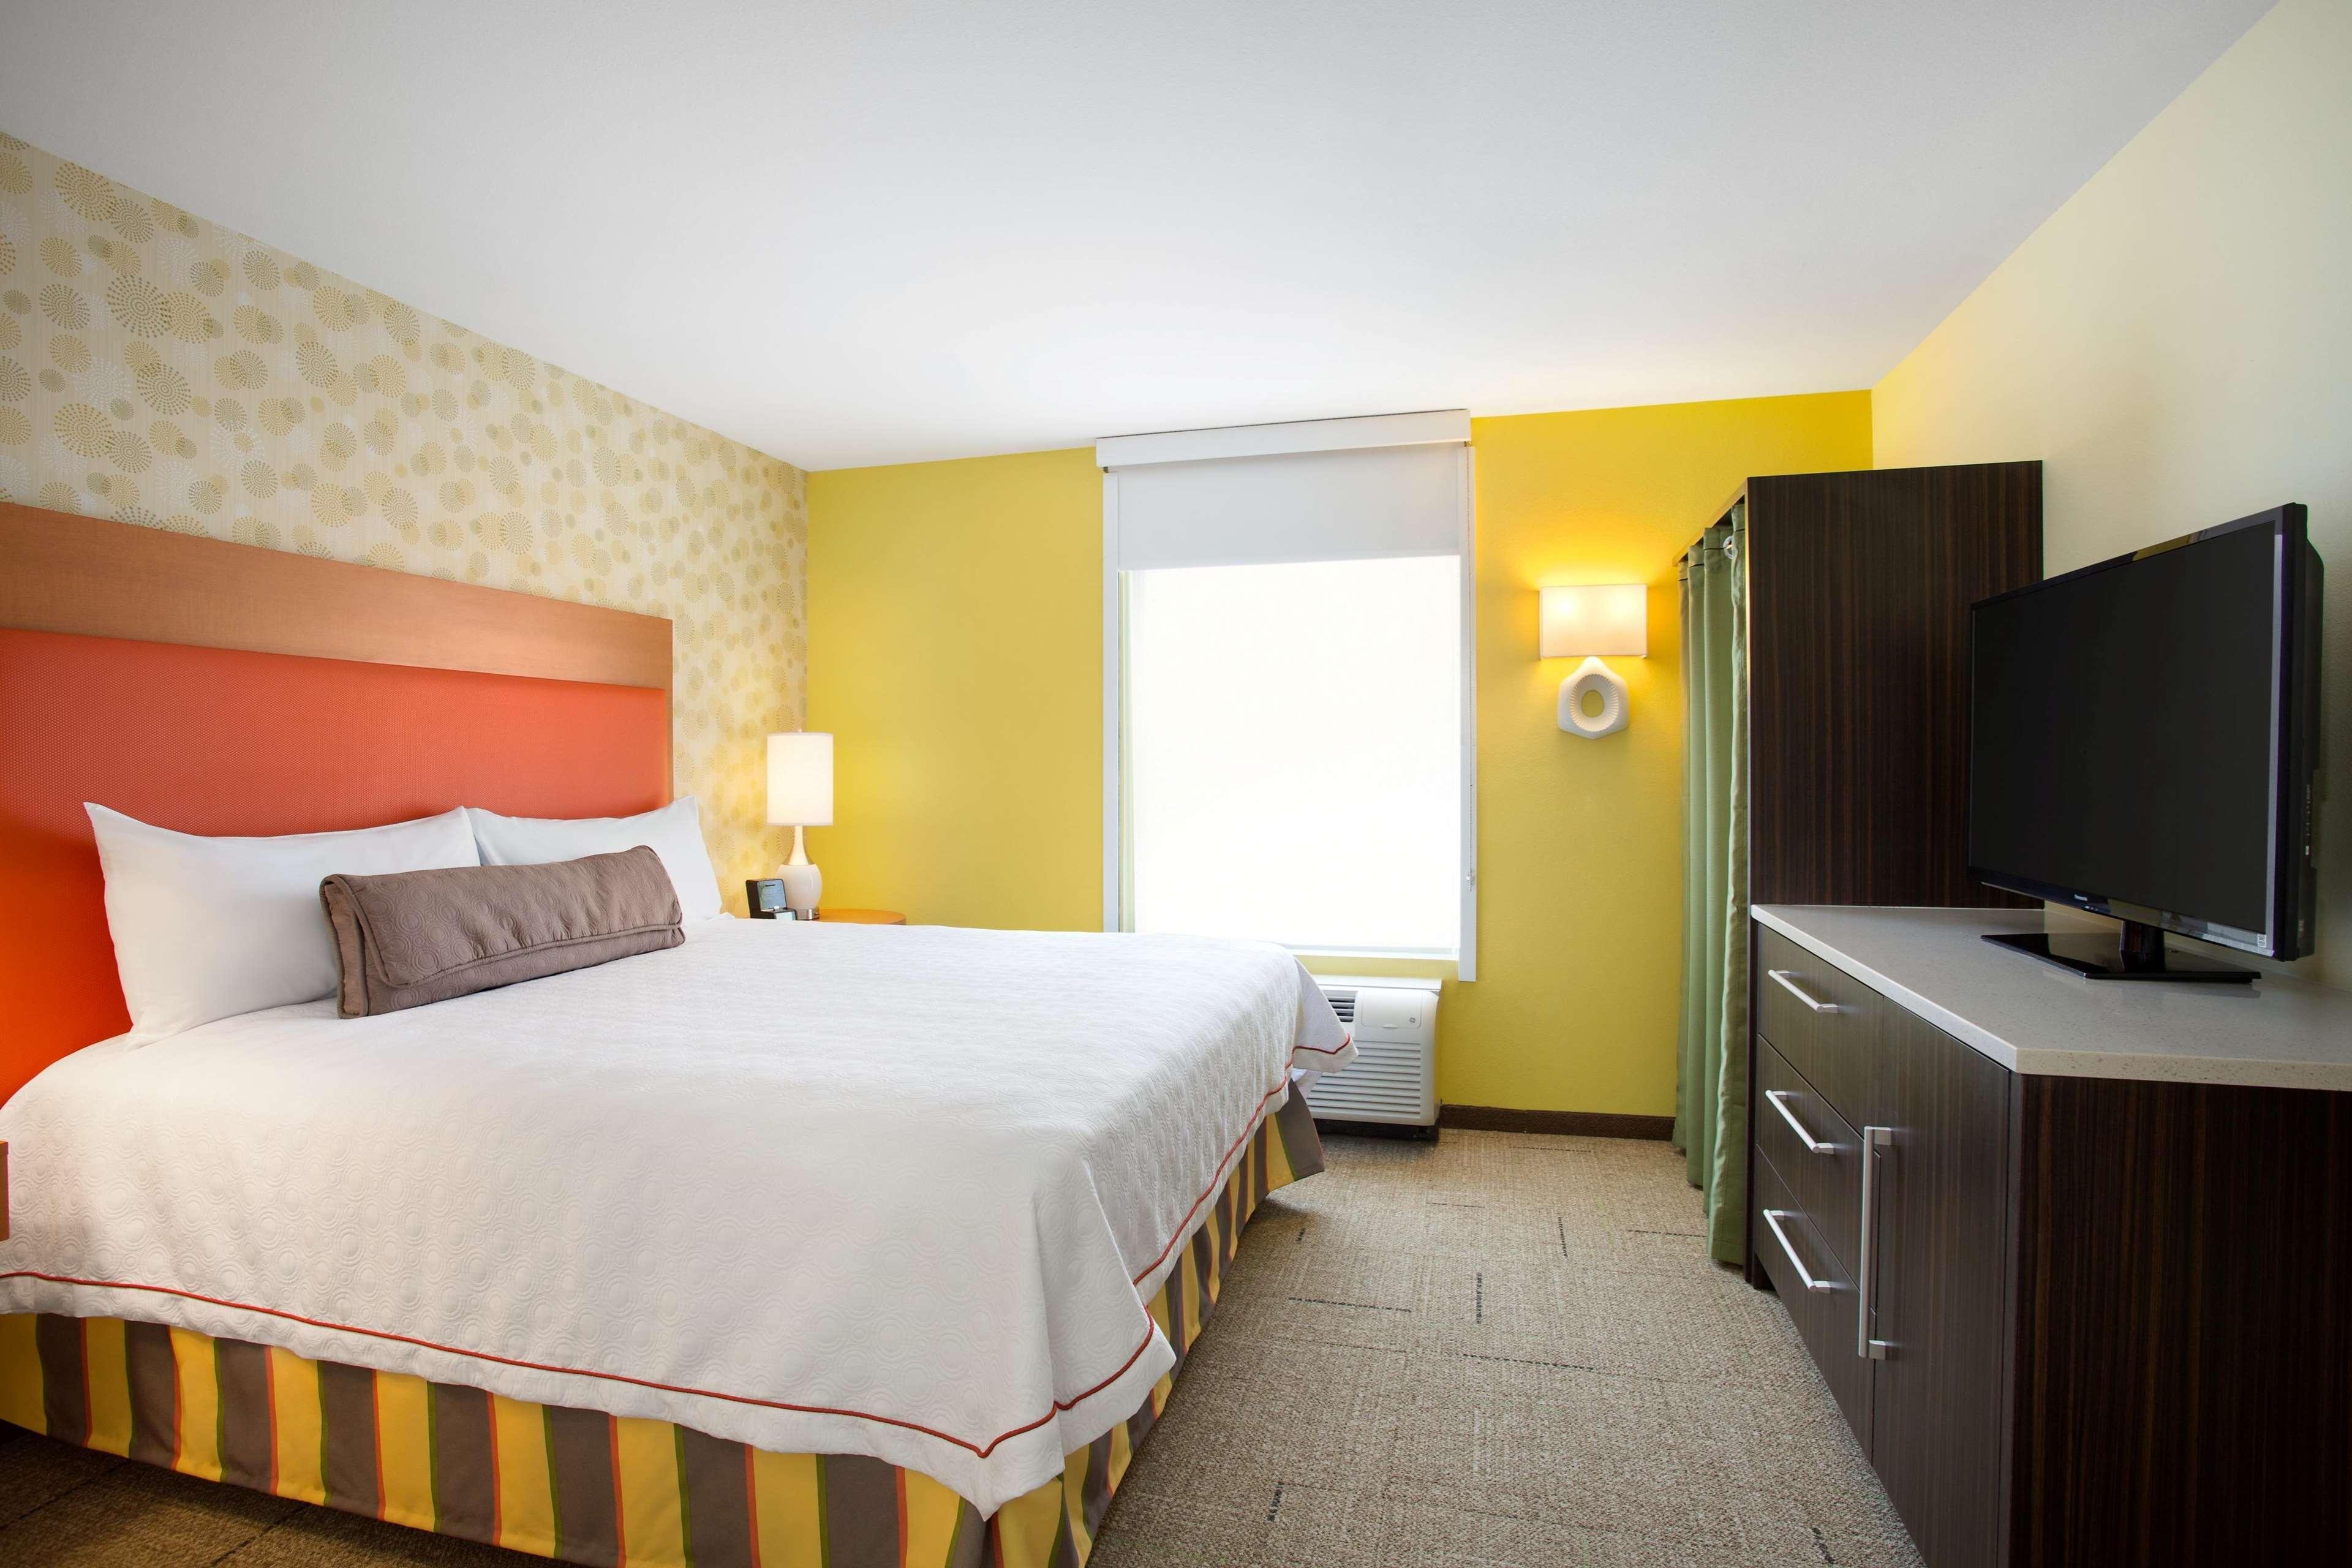 Home2 Suites by Hilton San Antonio Airport, TX image 3